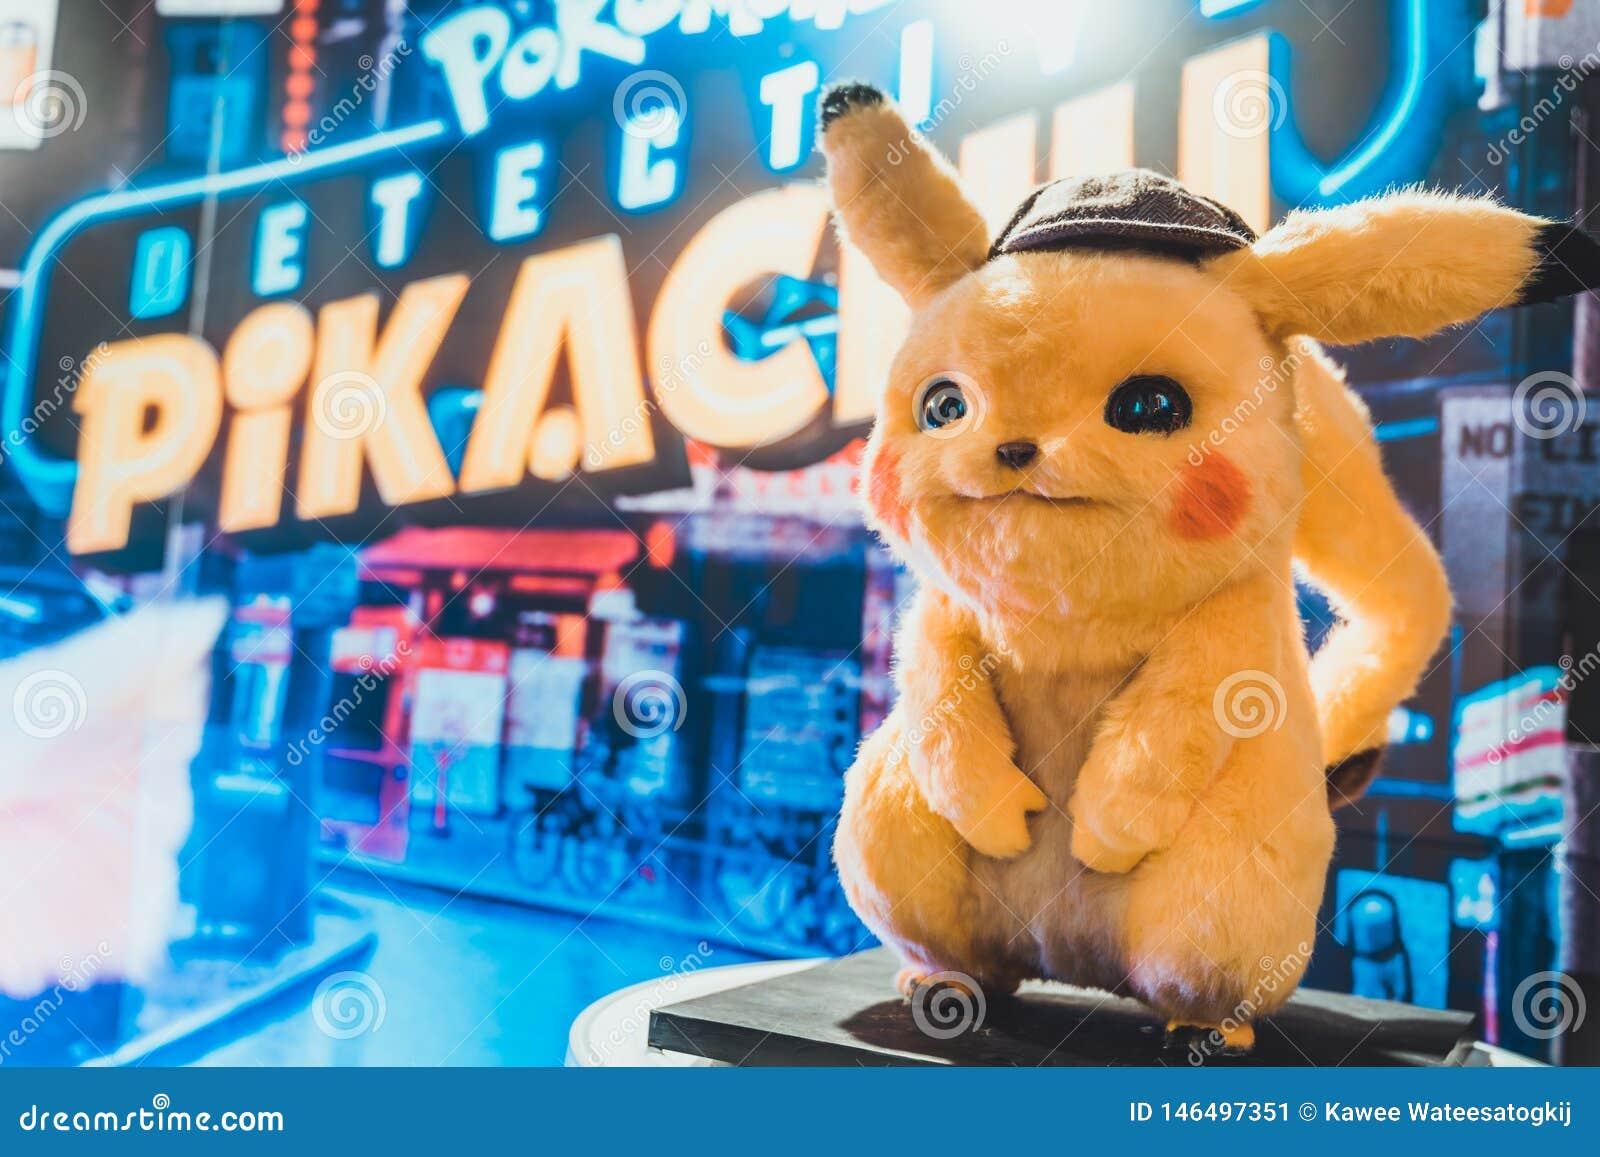 Detective Pikachu Display Stand